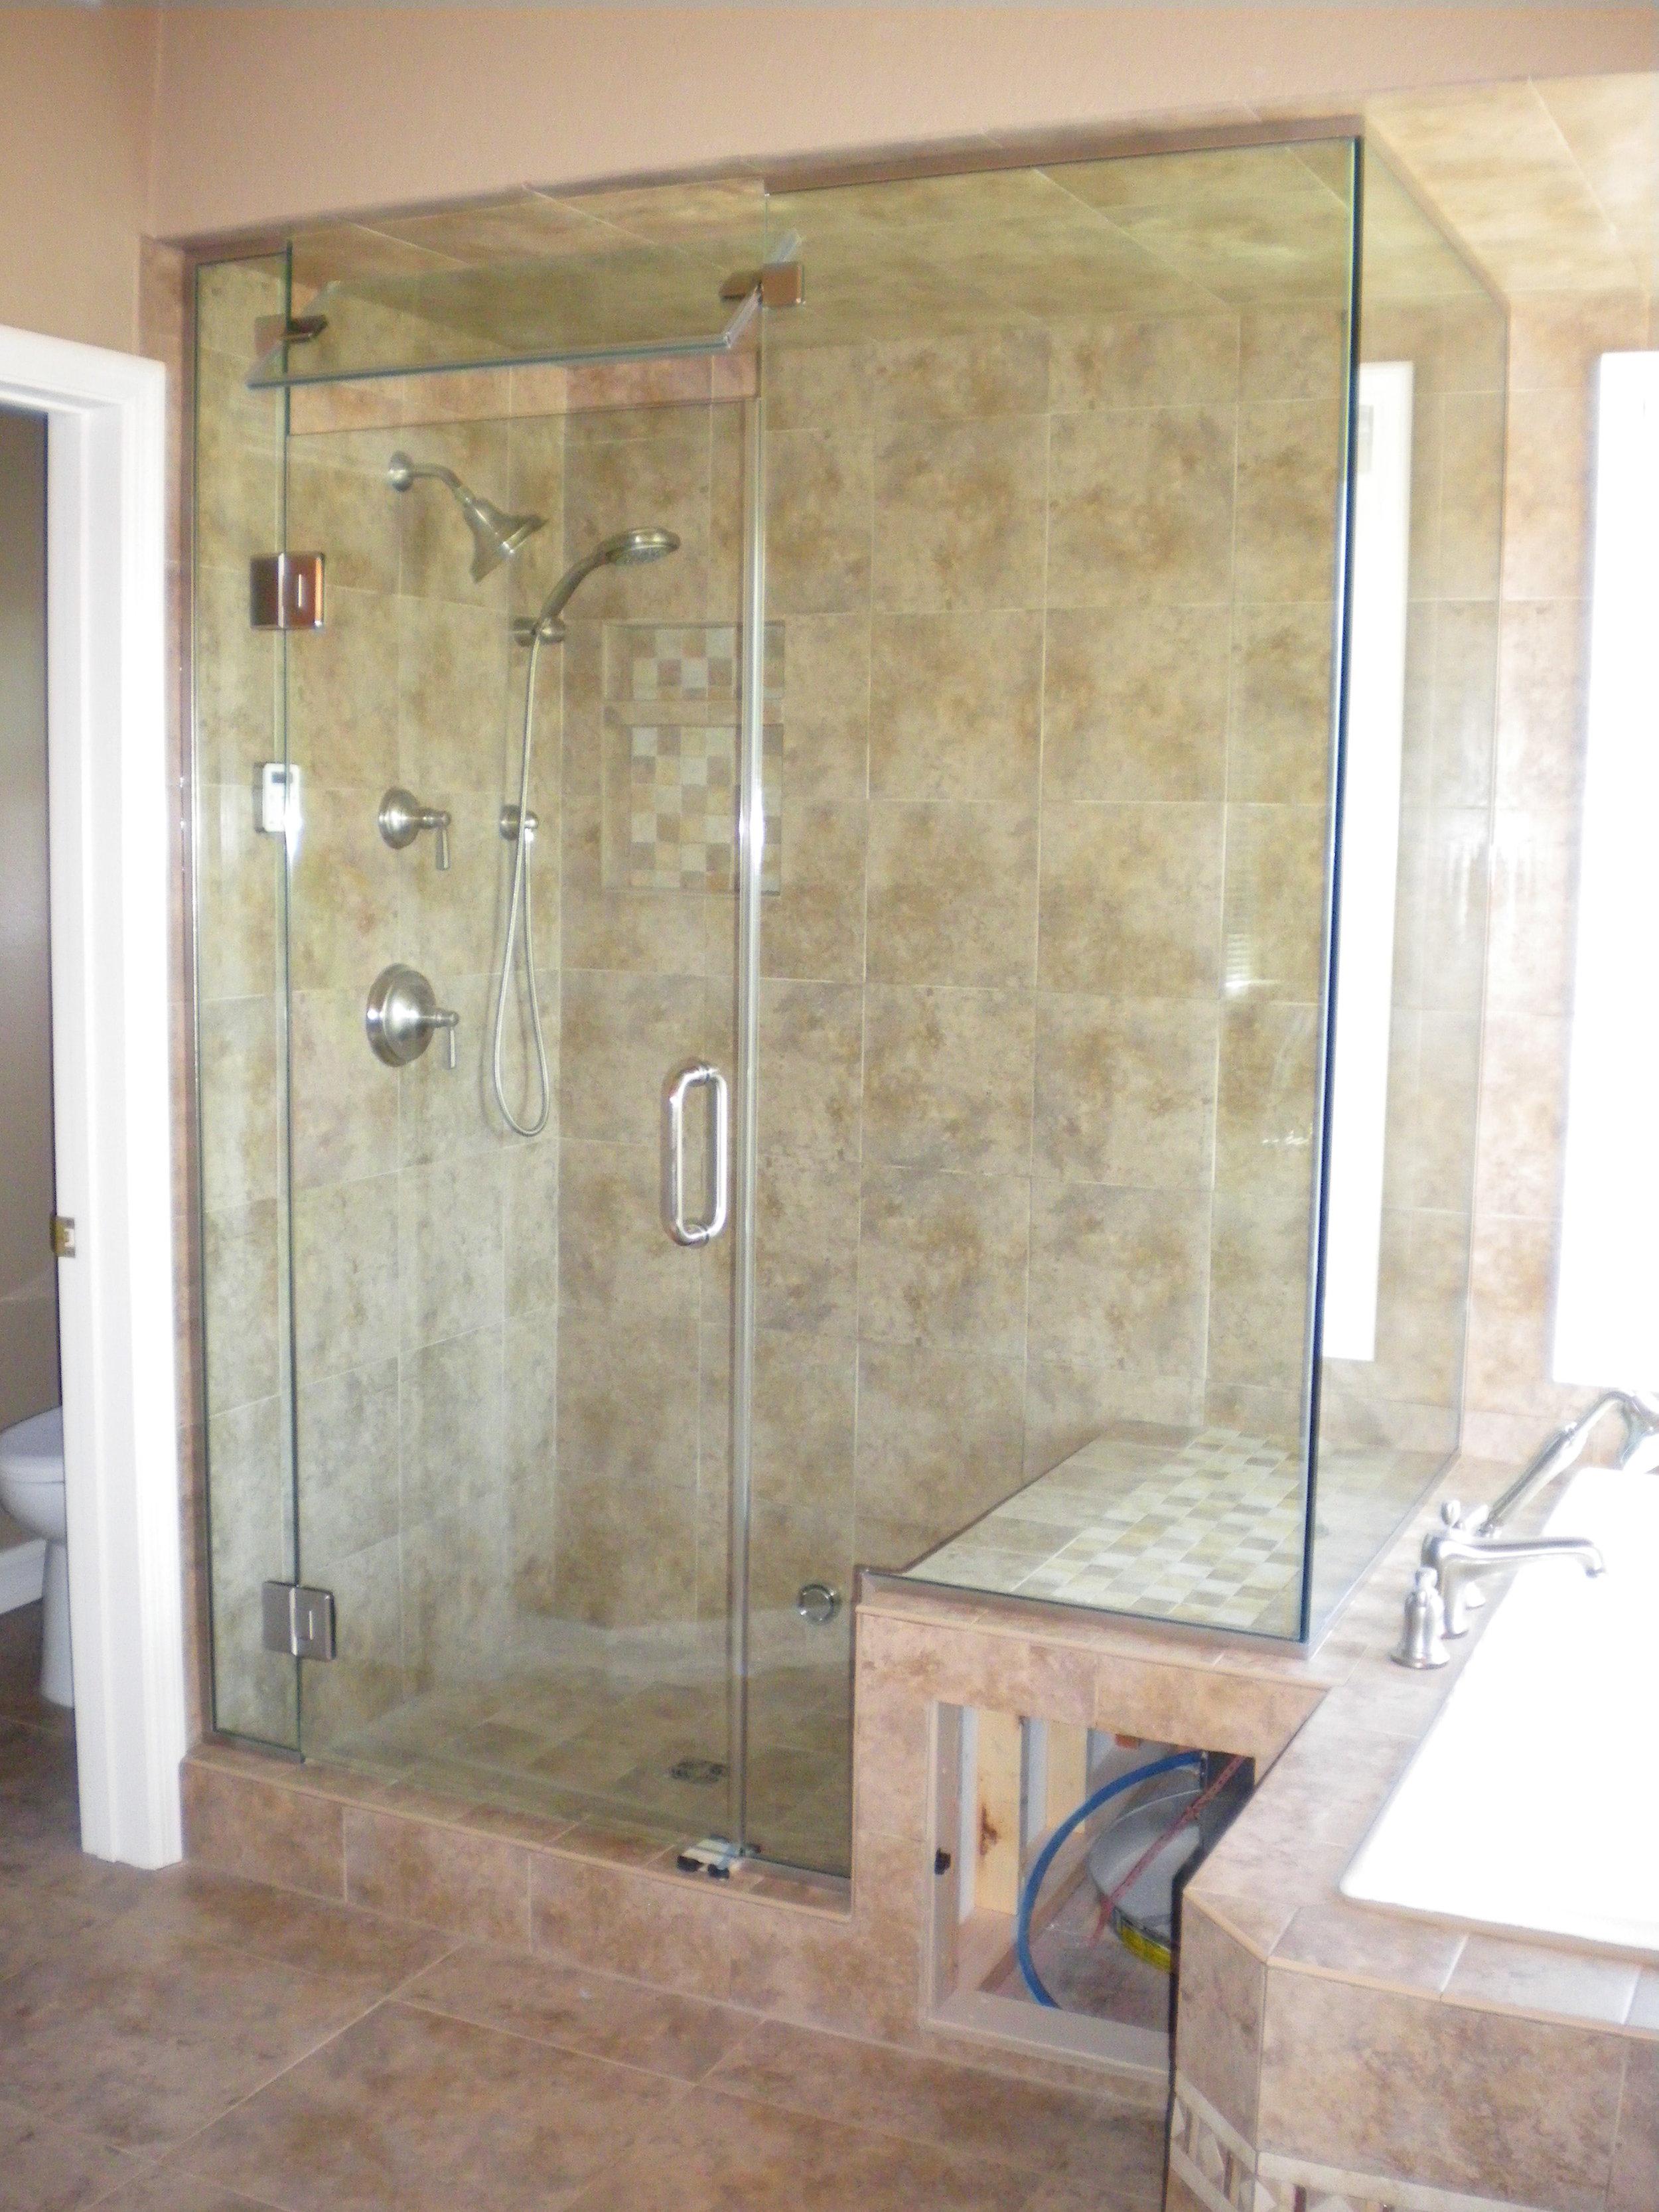 Shower-Doors-Residential-Photos-5.jpg